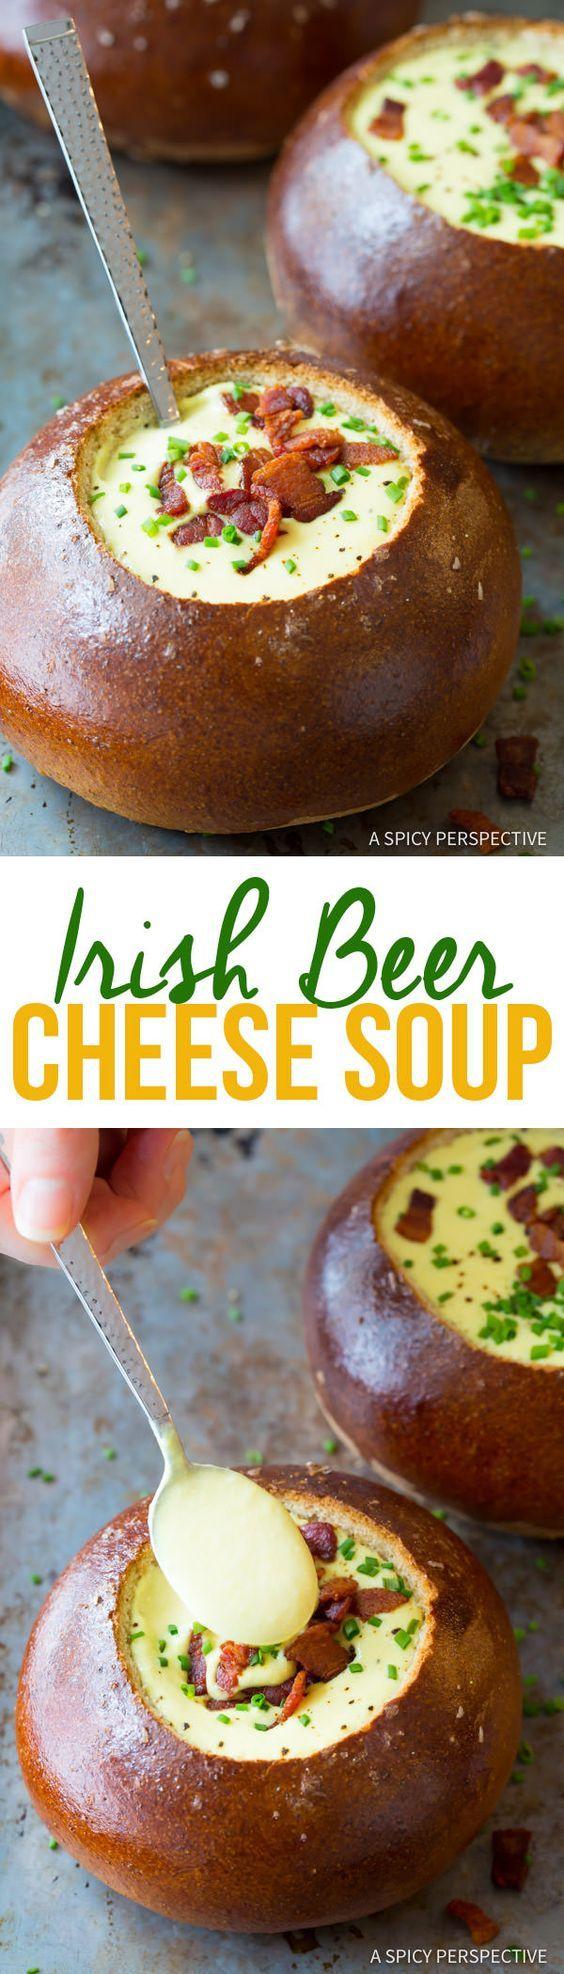 Irish Beer Cheese Soup